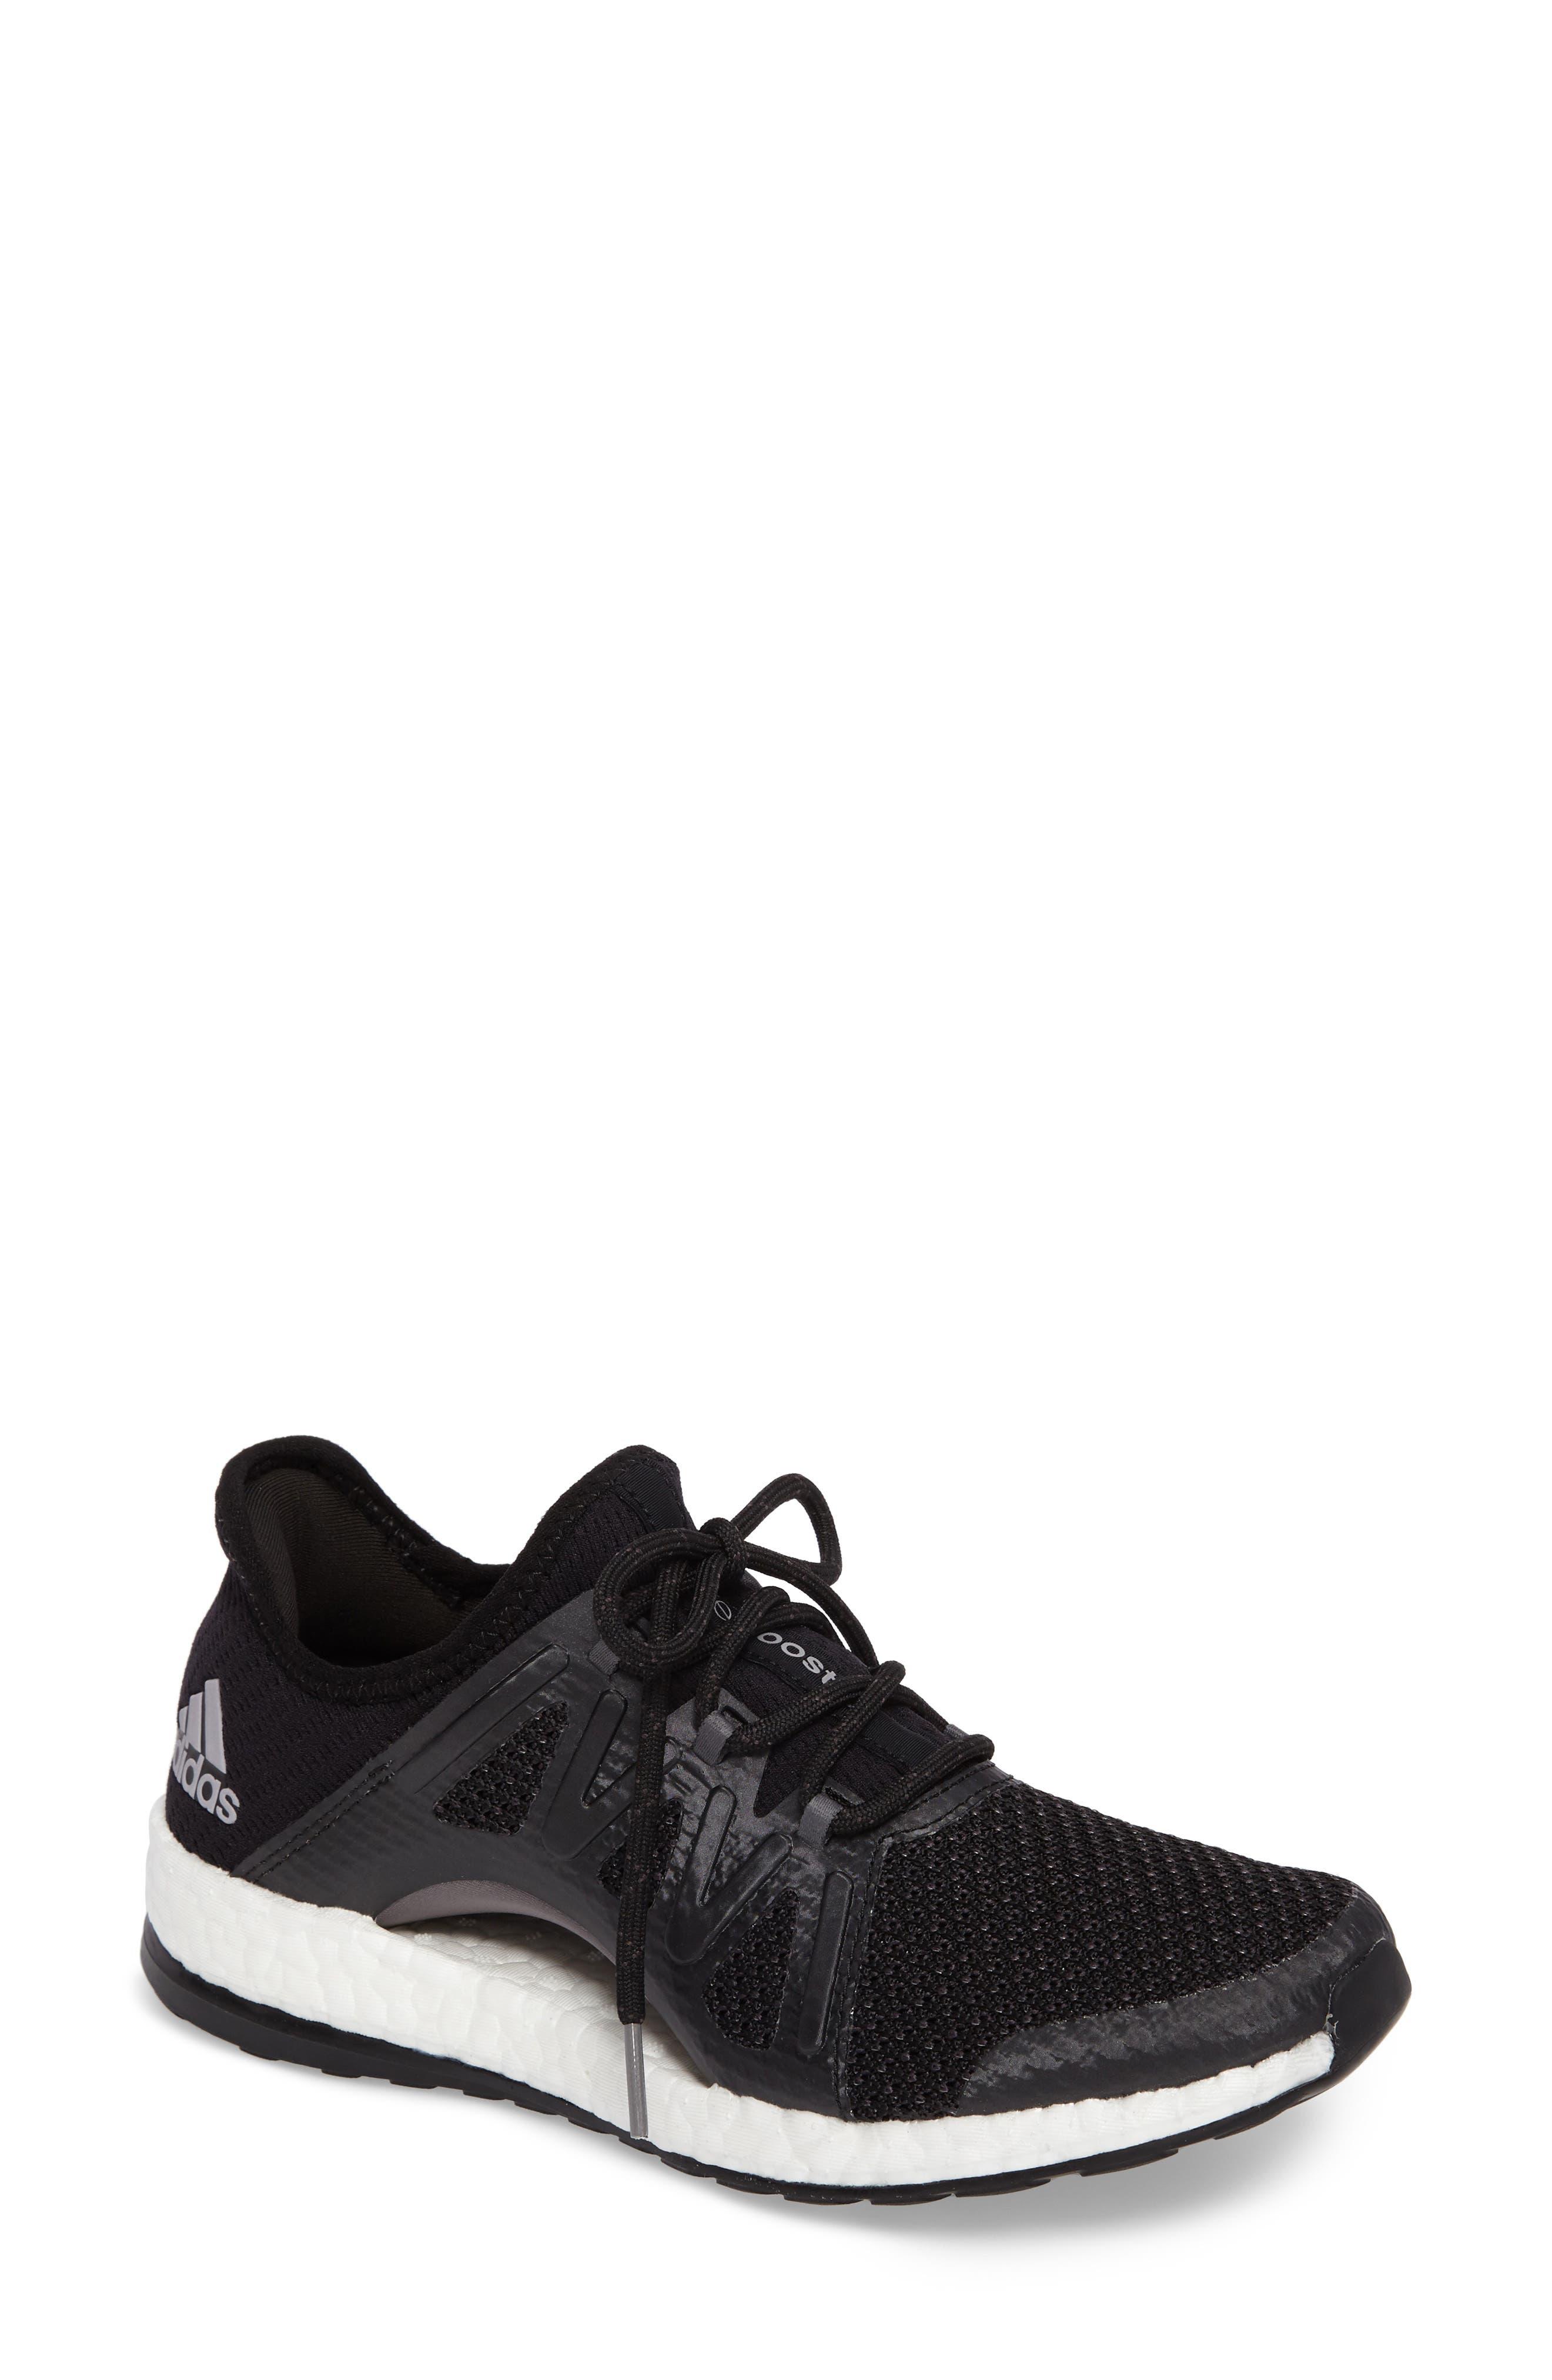 ADIDAS PureBOOST Xpose Running Shoe